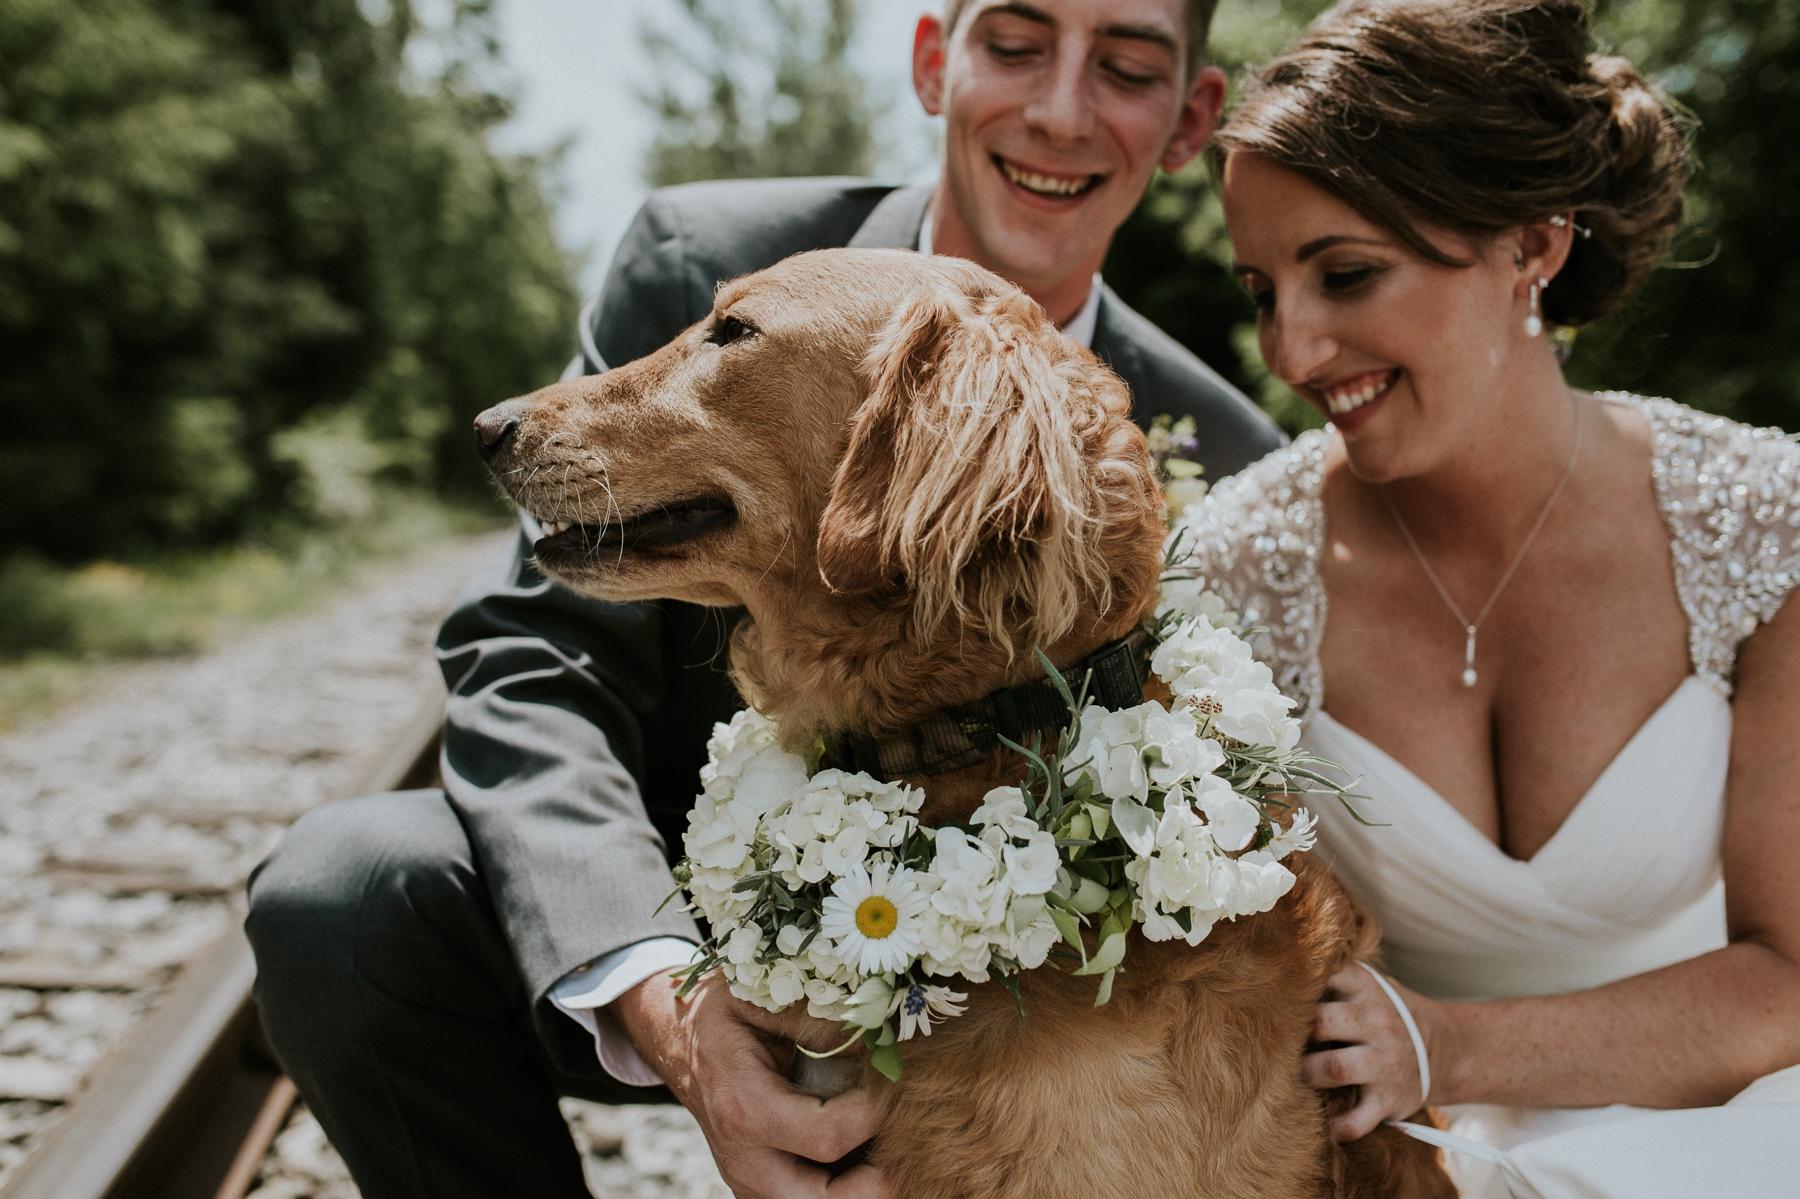 buffalo-new-york-hamburg-beach-wedding-photography 32.jpg